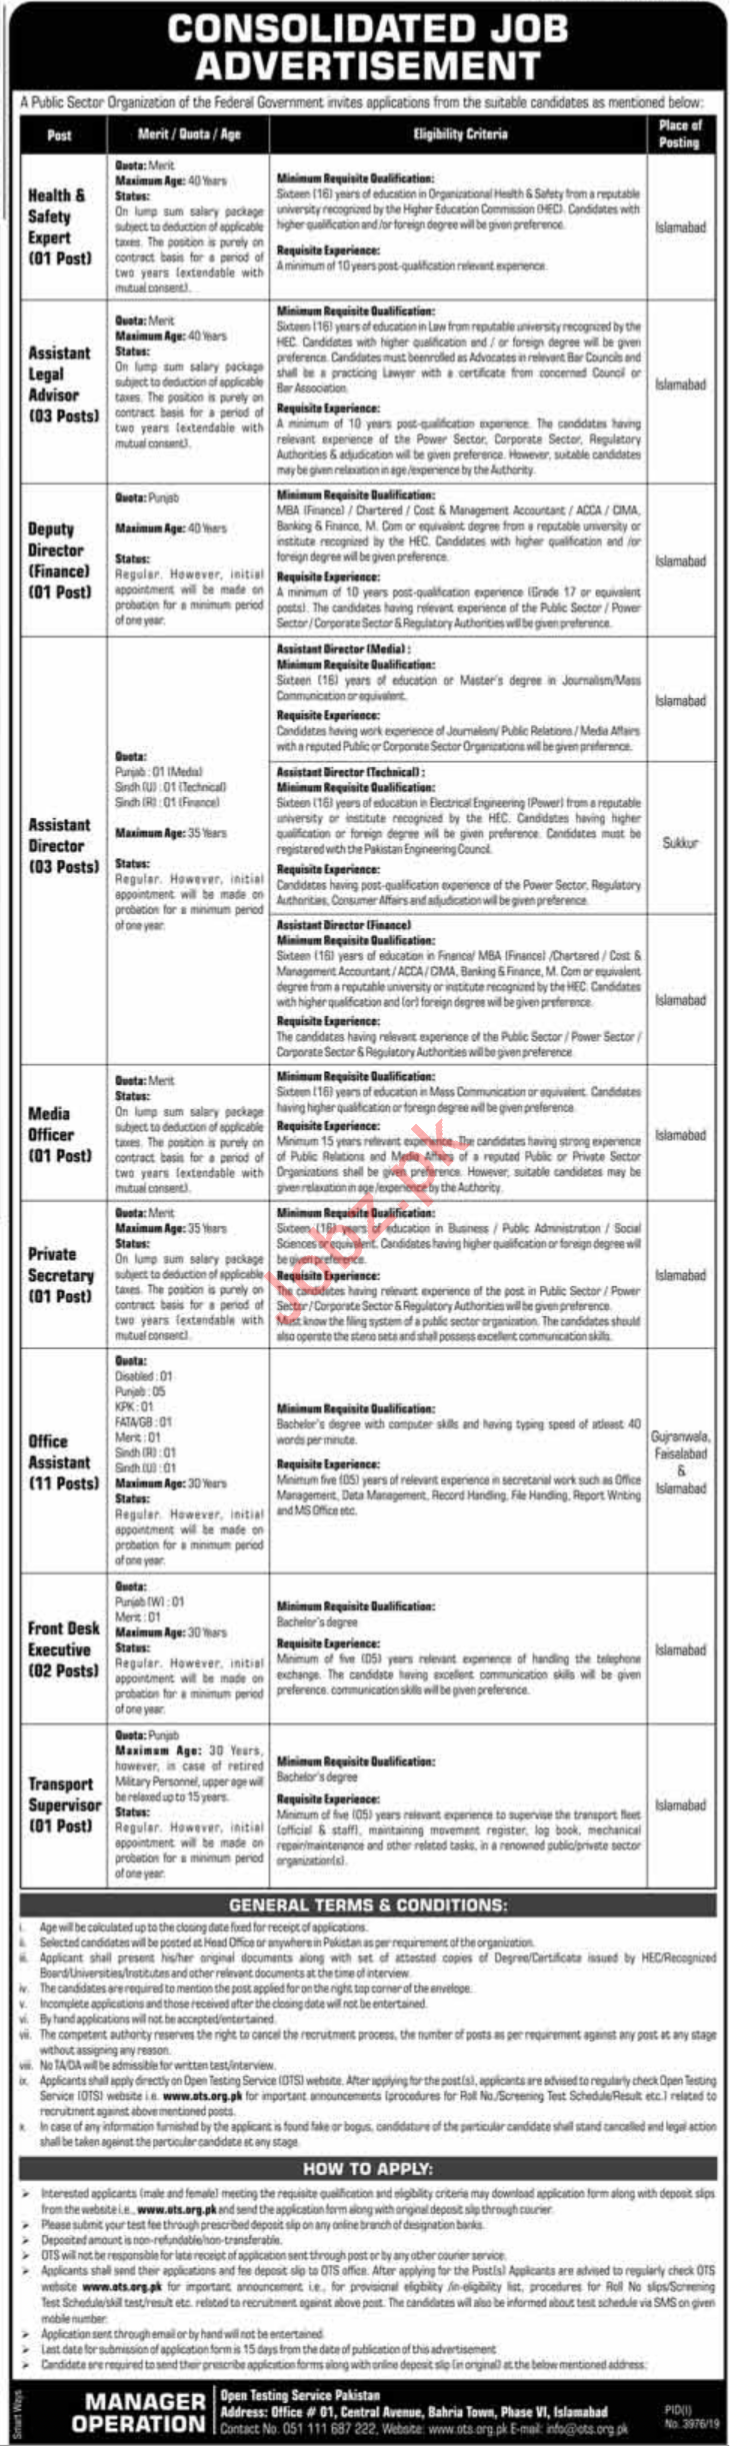 Pakistan Atomic Energy Commission PAEC Jobs 2020 via OTS